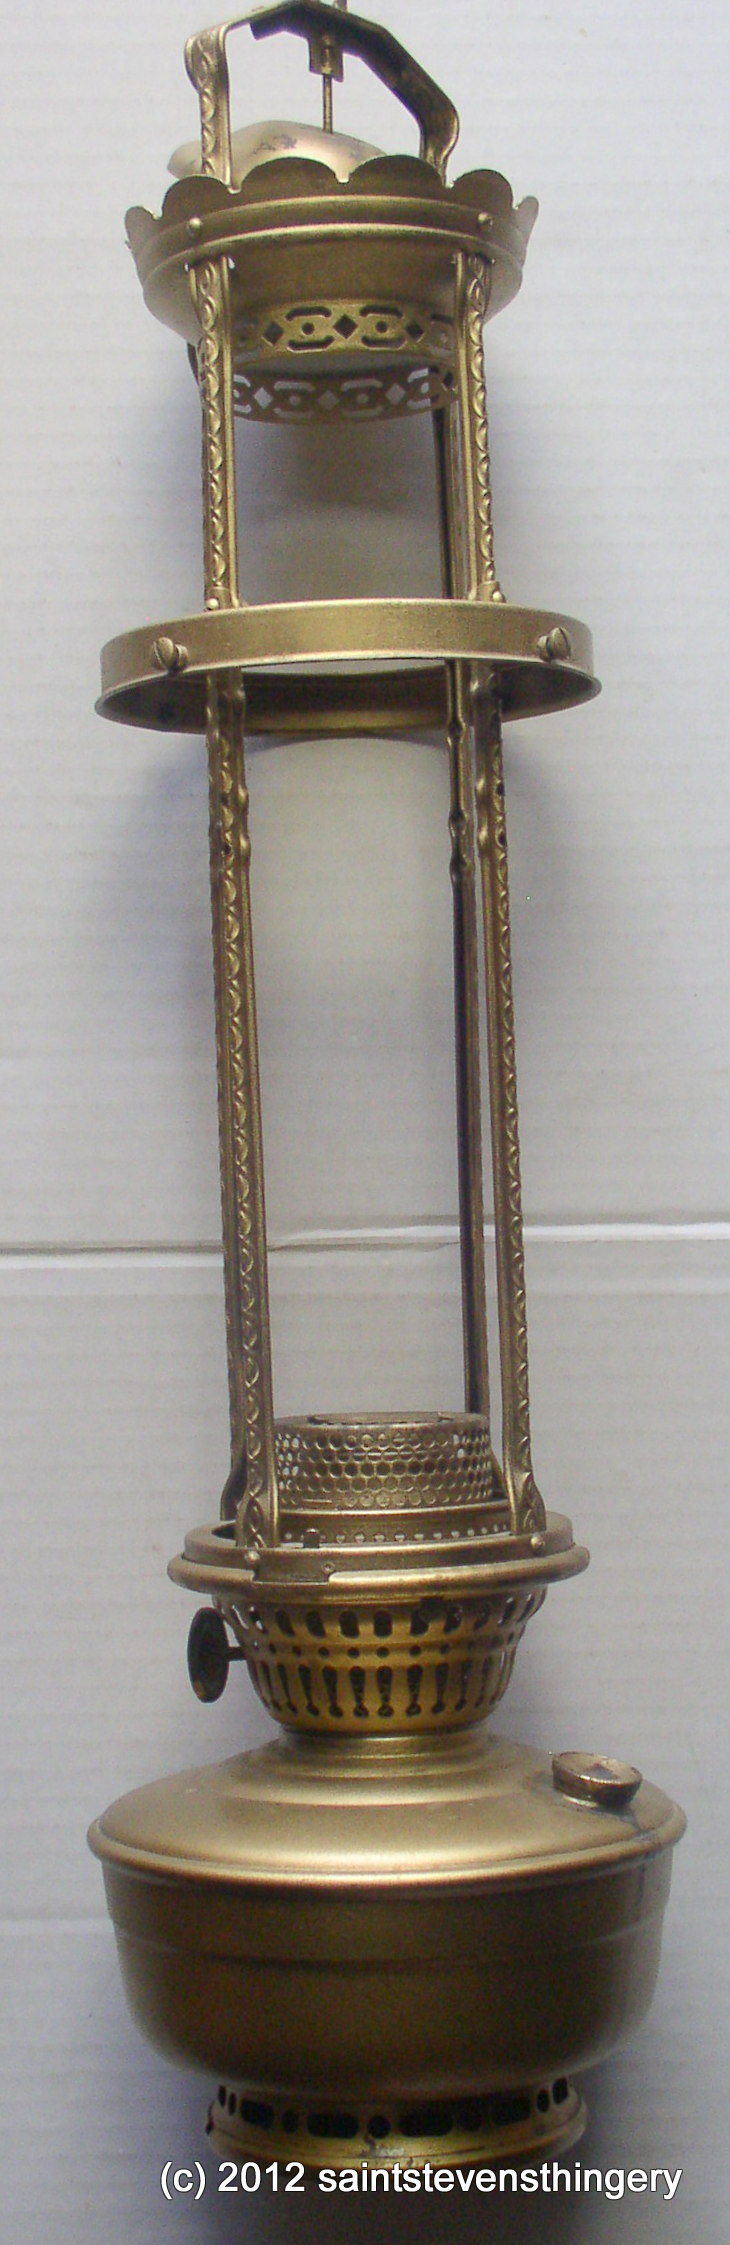 Aladdin Model 12 Hanging 4 Post Oil Lamp Thingery